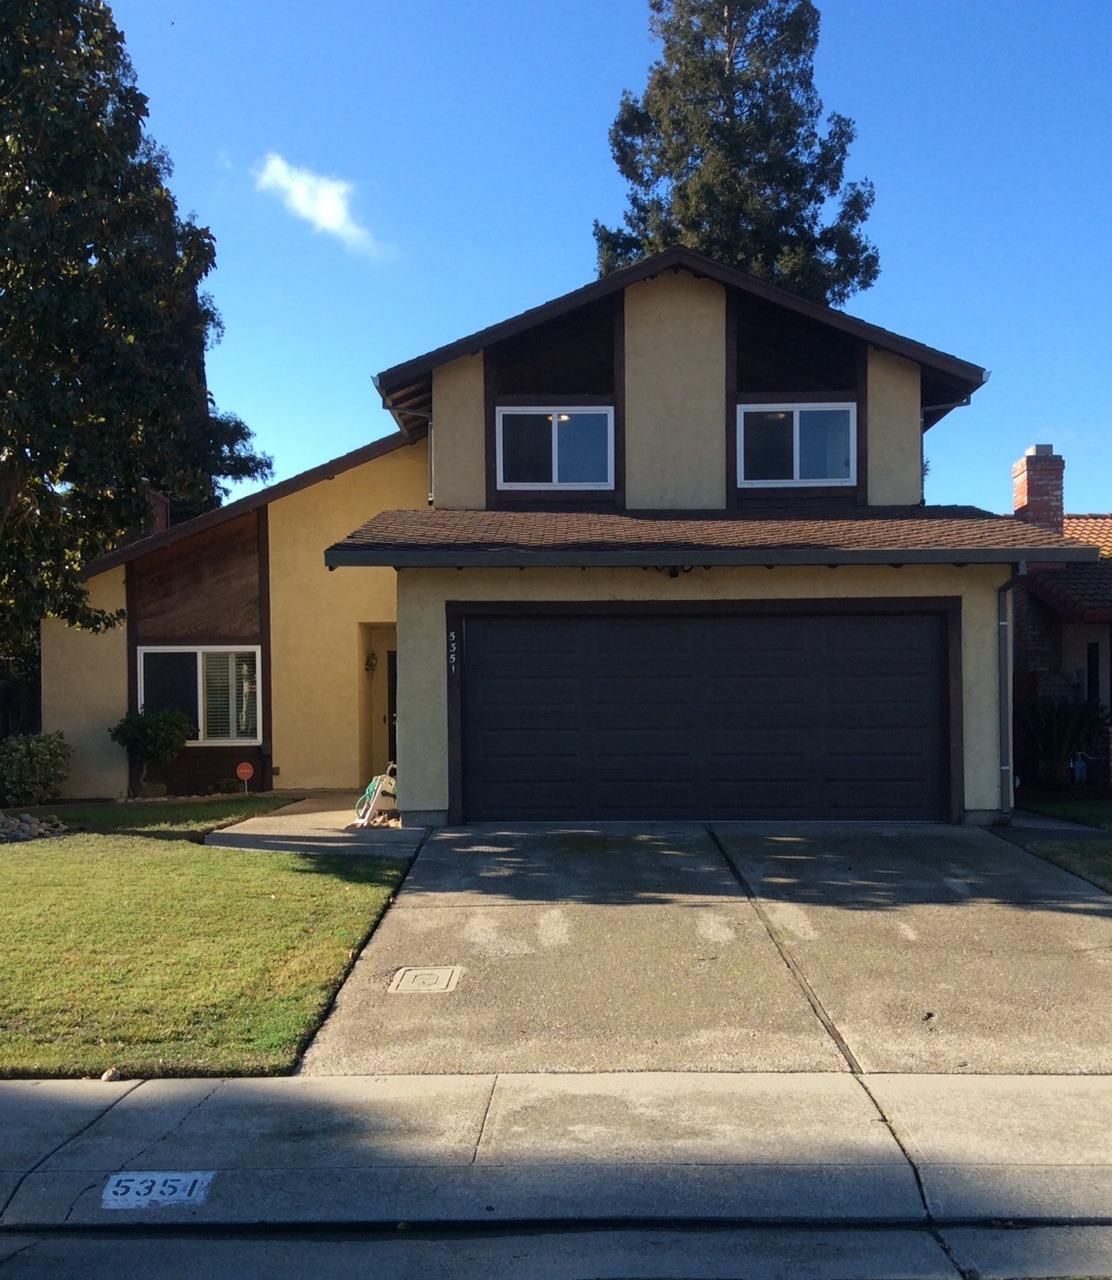 Photo of 5351 Verdi Way, Stockton, CA 95207